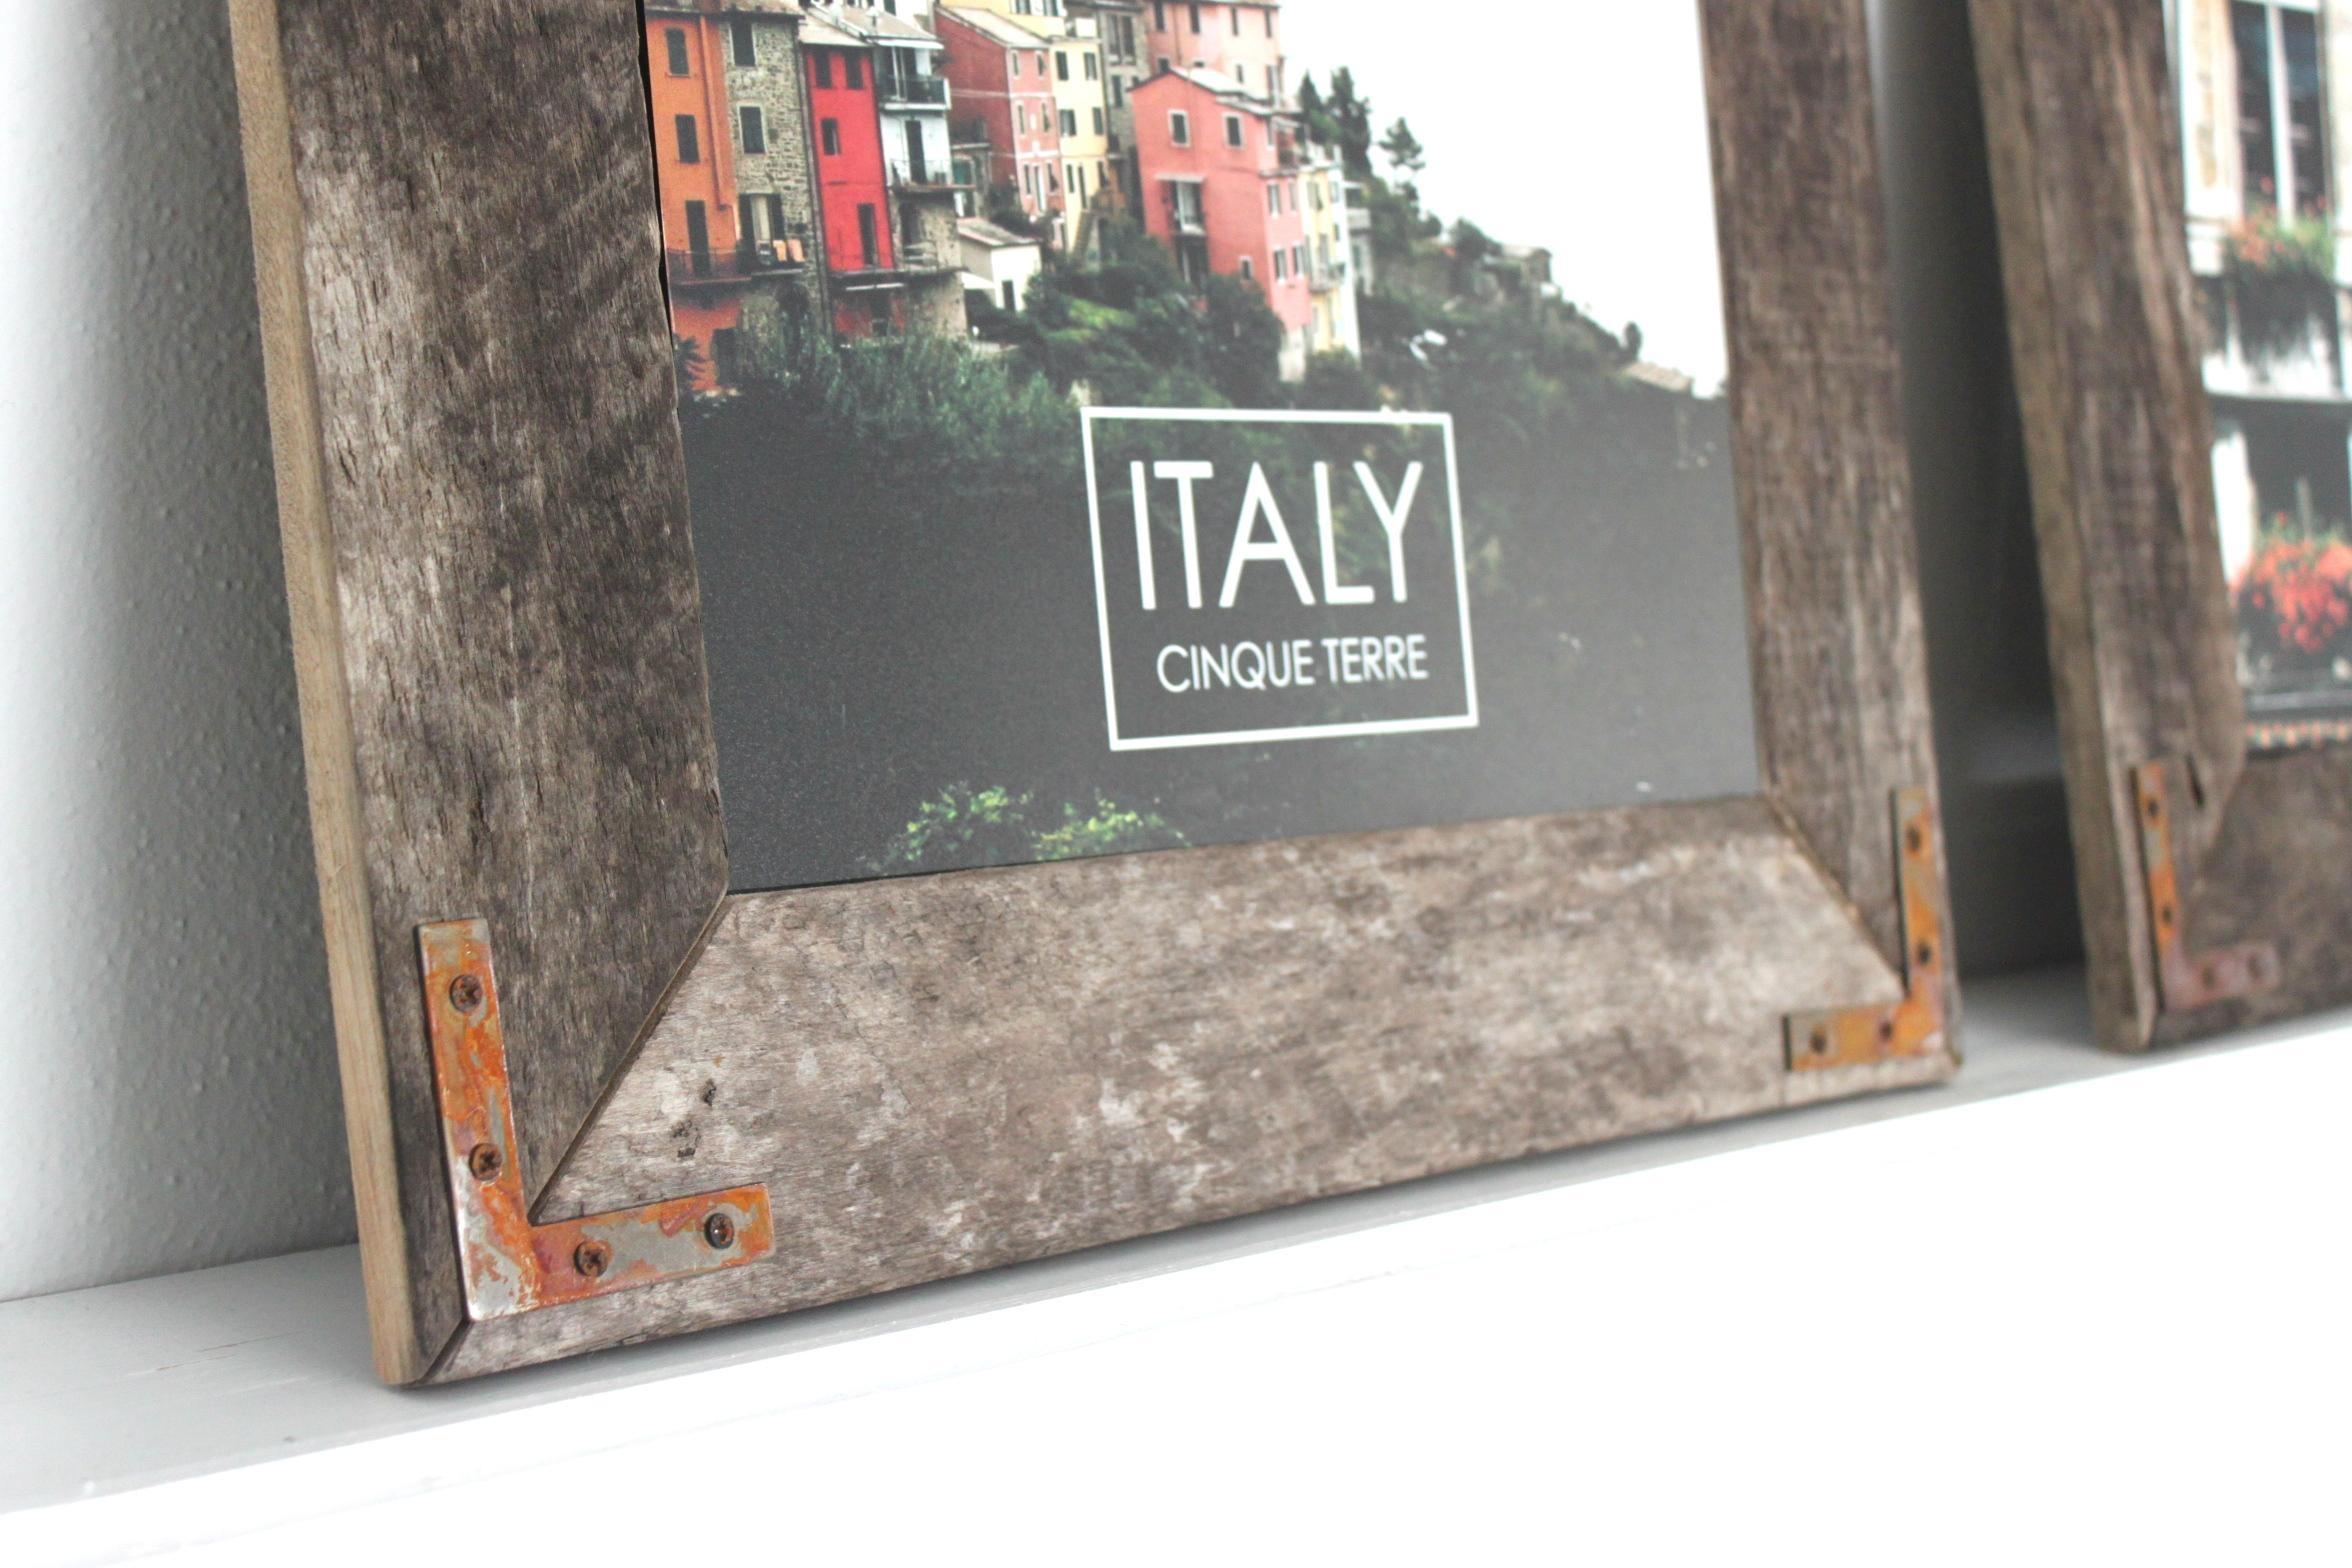 Remodelaholic | Easy Diy Rustic Industrial Picture Frame Throughout Diy Industrial Wall Art (Image 14 of 20)